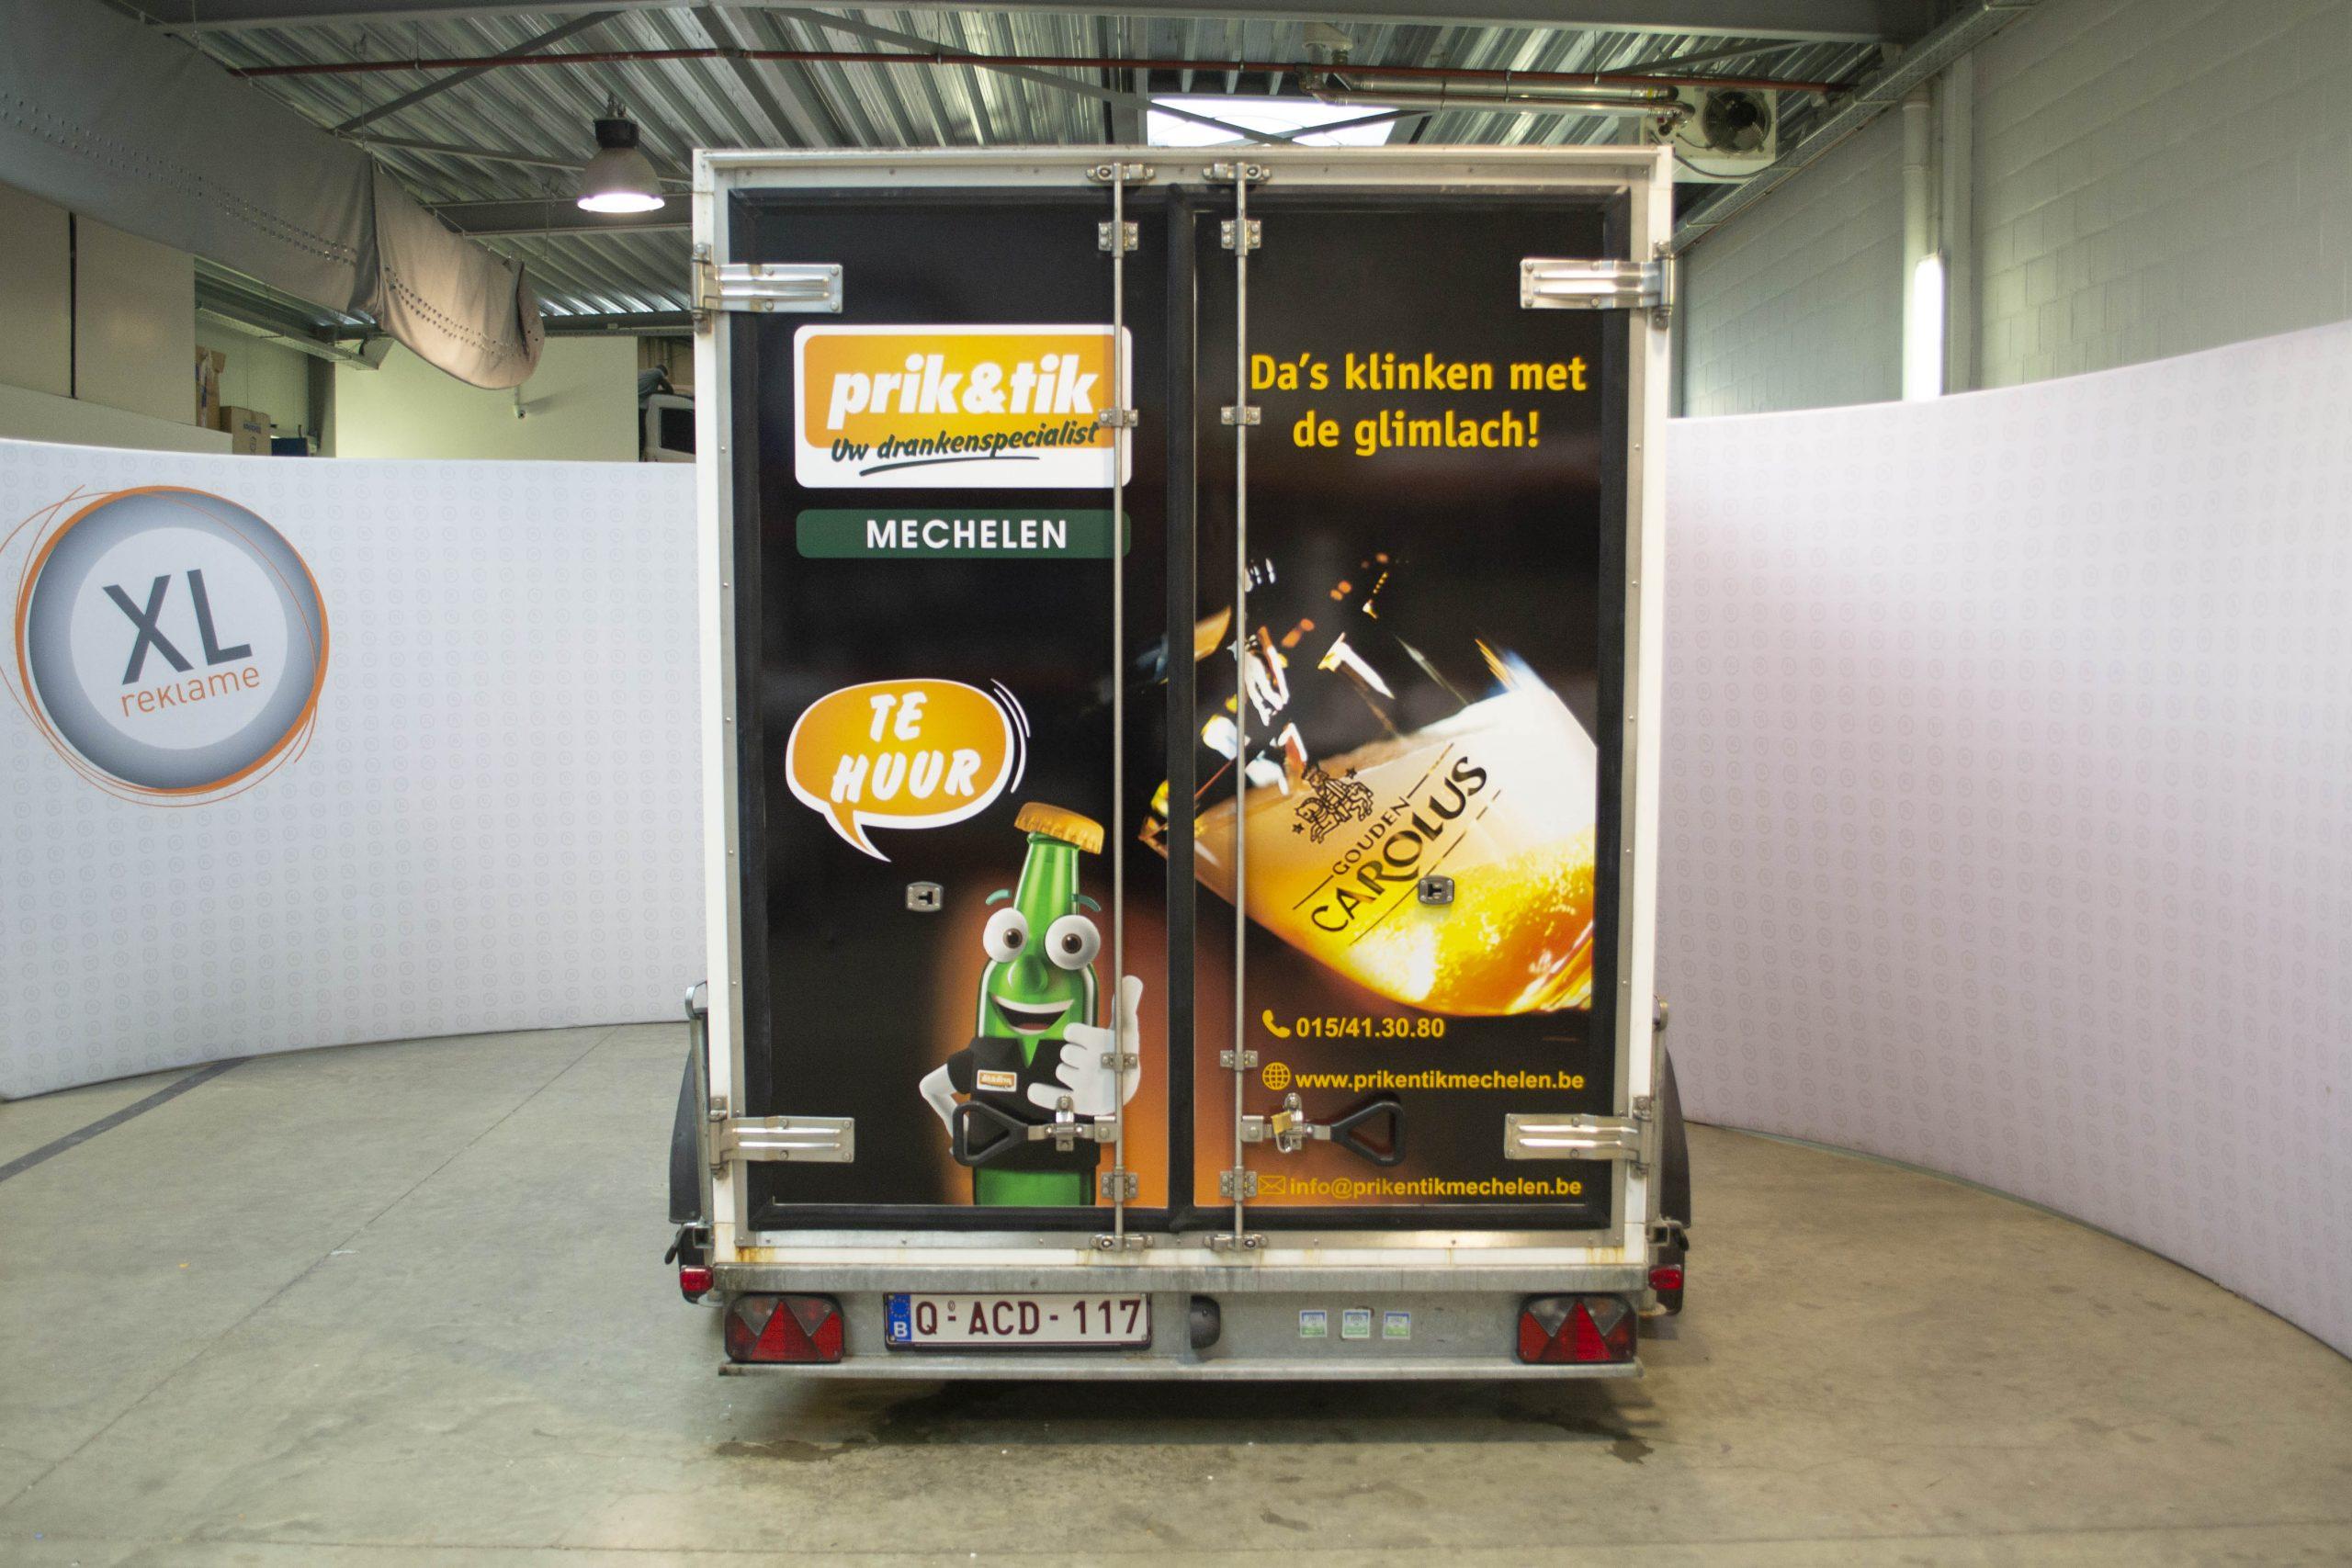 Autobelettering Swapfiets - XL Reklame Mechelen